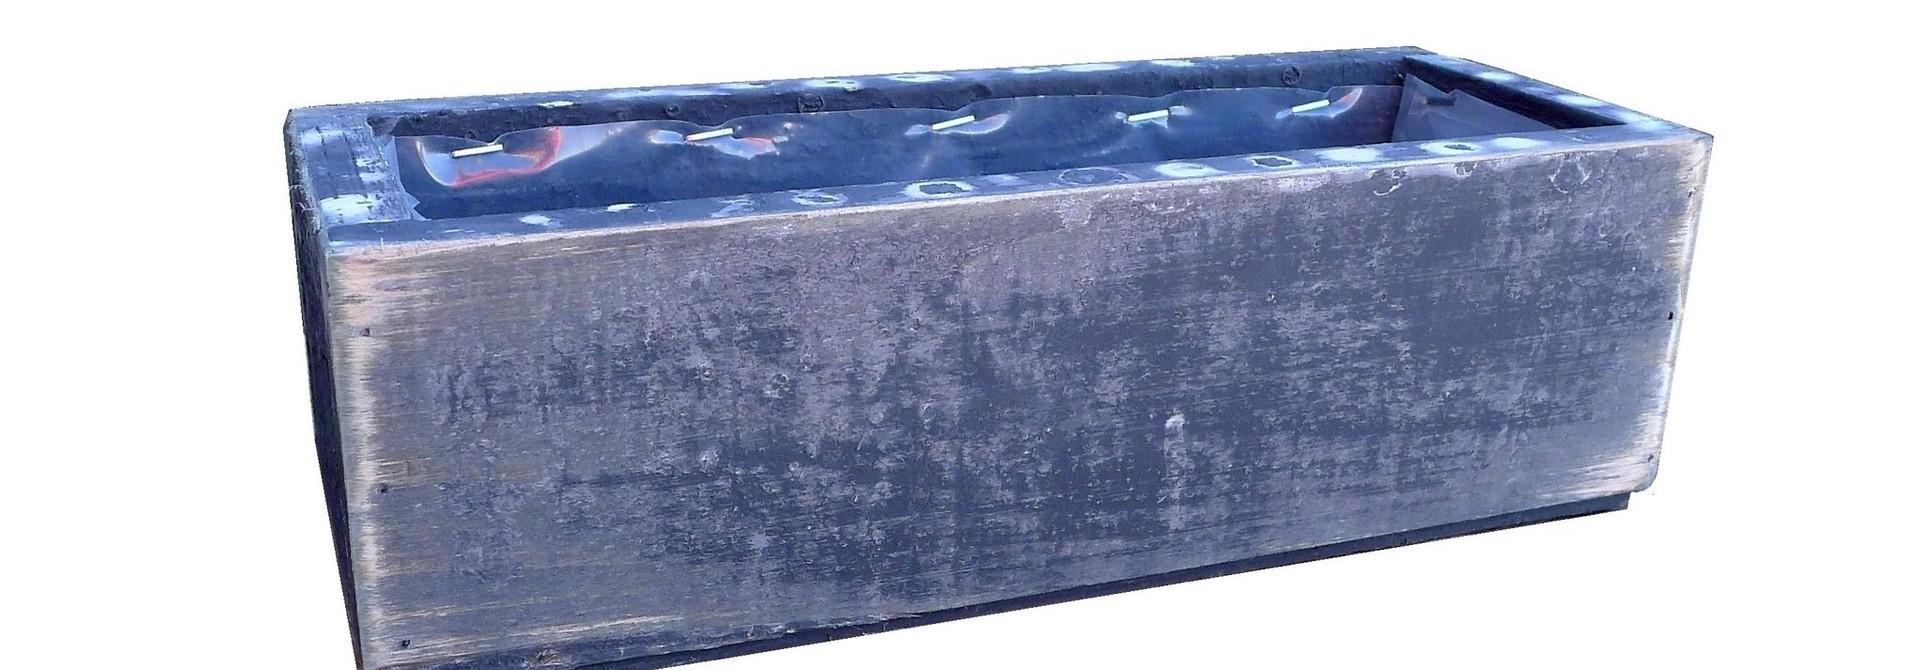 pot black berlin jacob 26/10